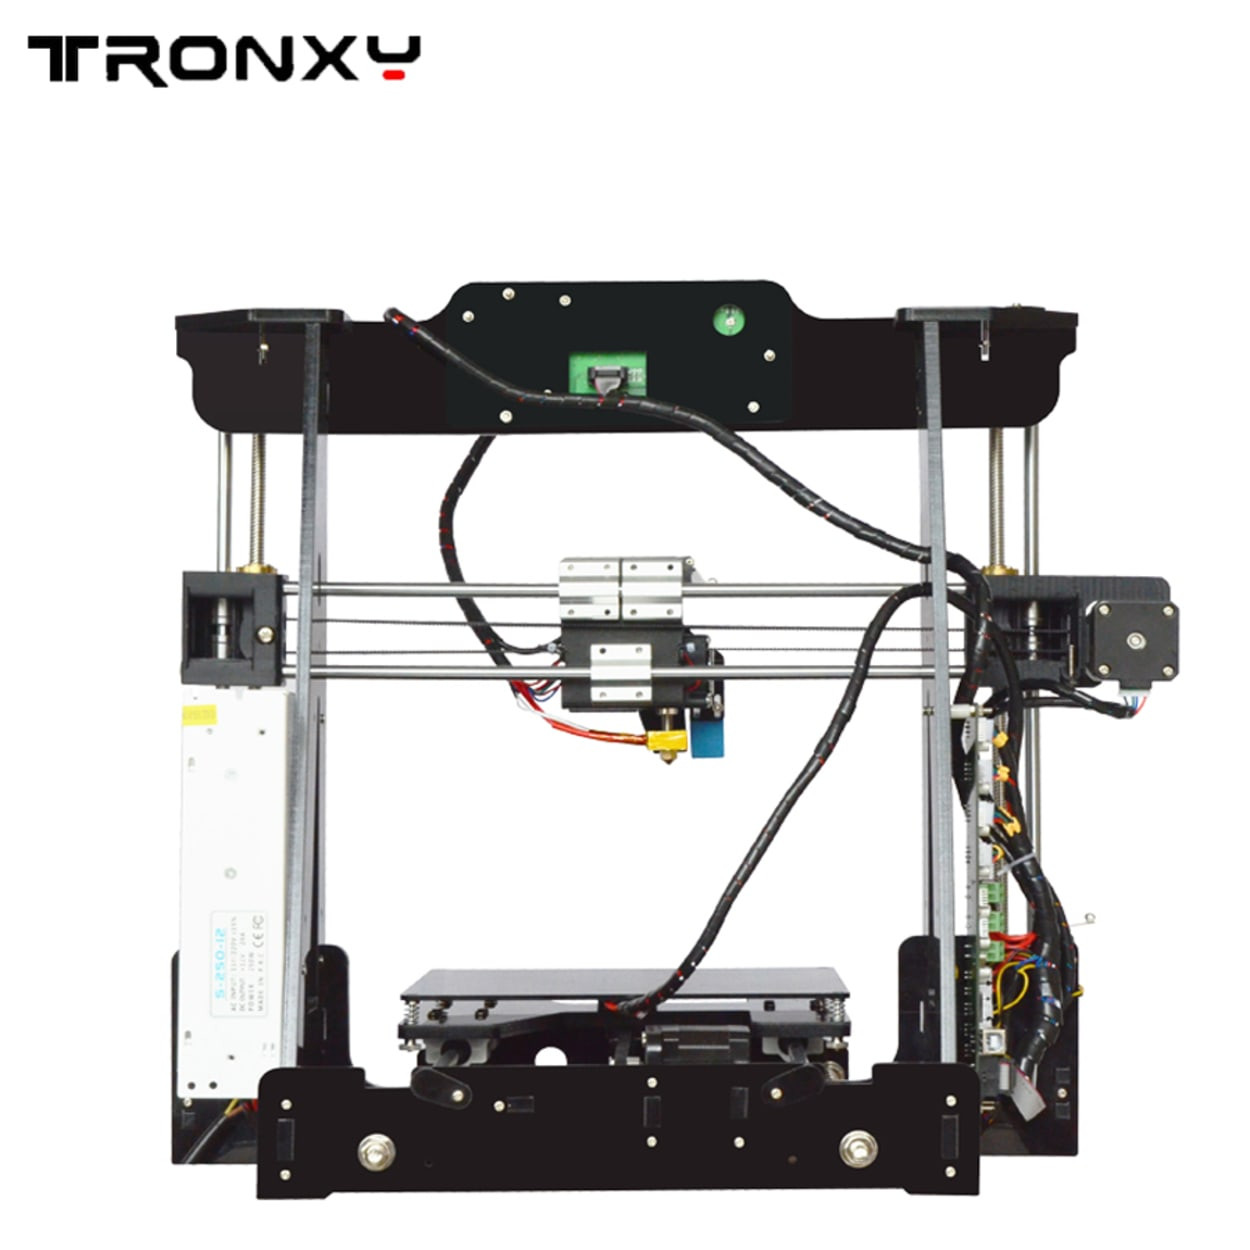 Best ideas about DIY 3D Printer Kit . Save or Pin TRONXY P802M DIY 3D Printer Kit 220 220 240mm Now.